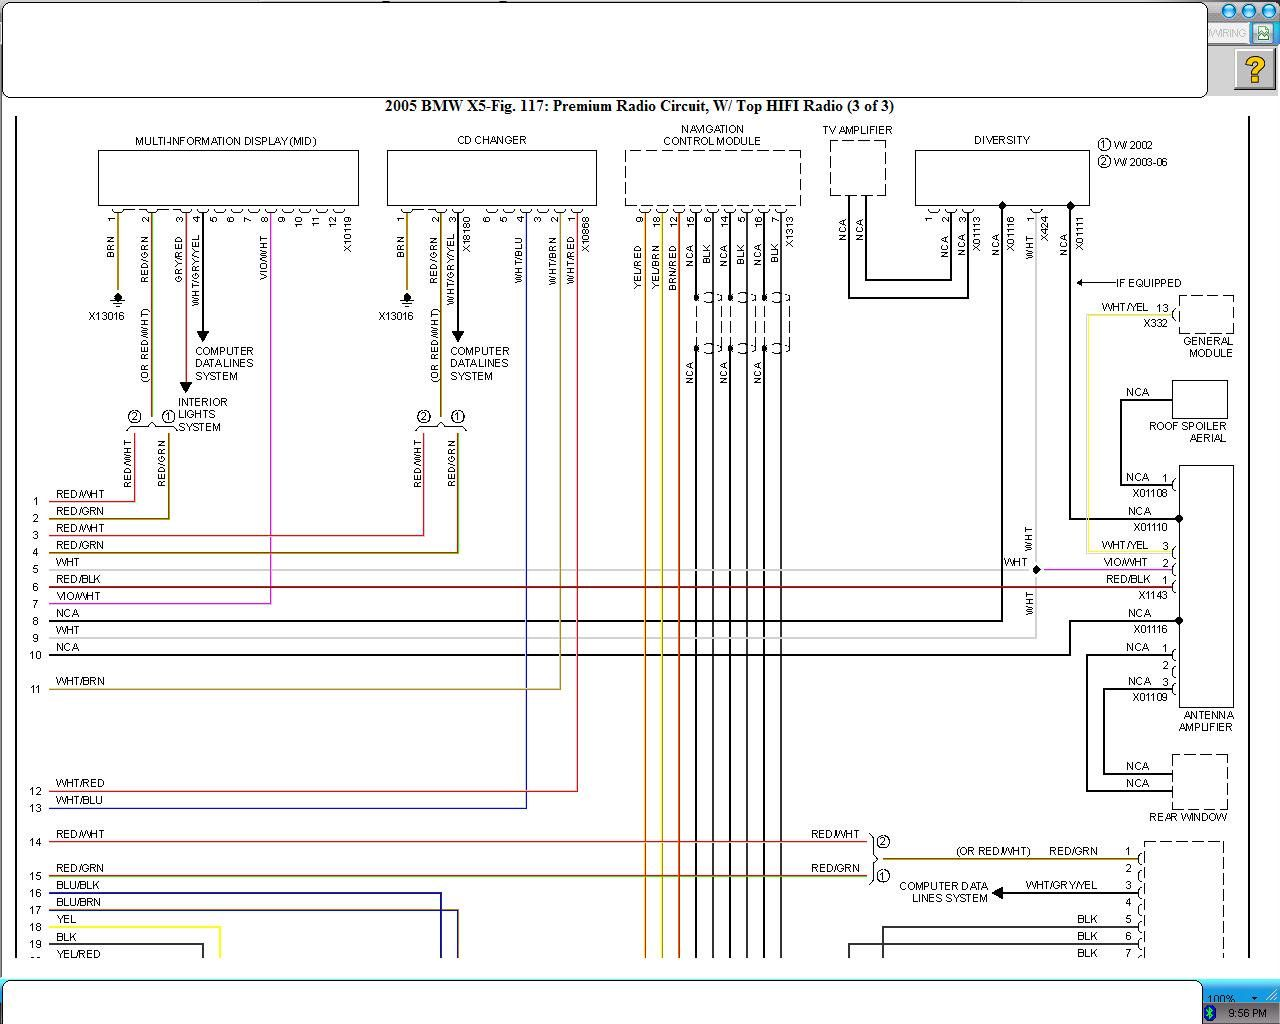 medium resolution of bmw x5 wiring diagram efcaviation com and e53 diagramas e60 wiring diagram bmw e53 wiring diagrams